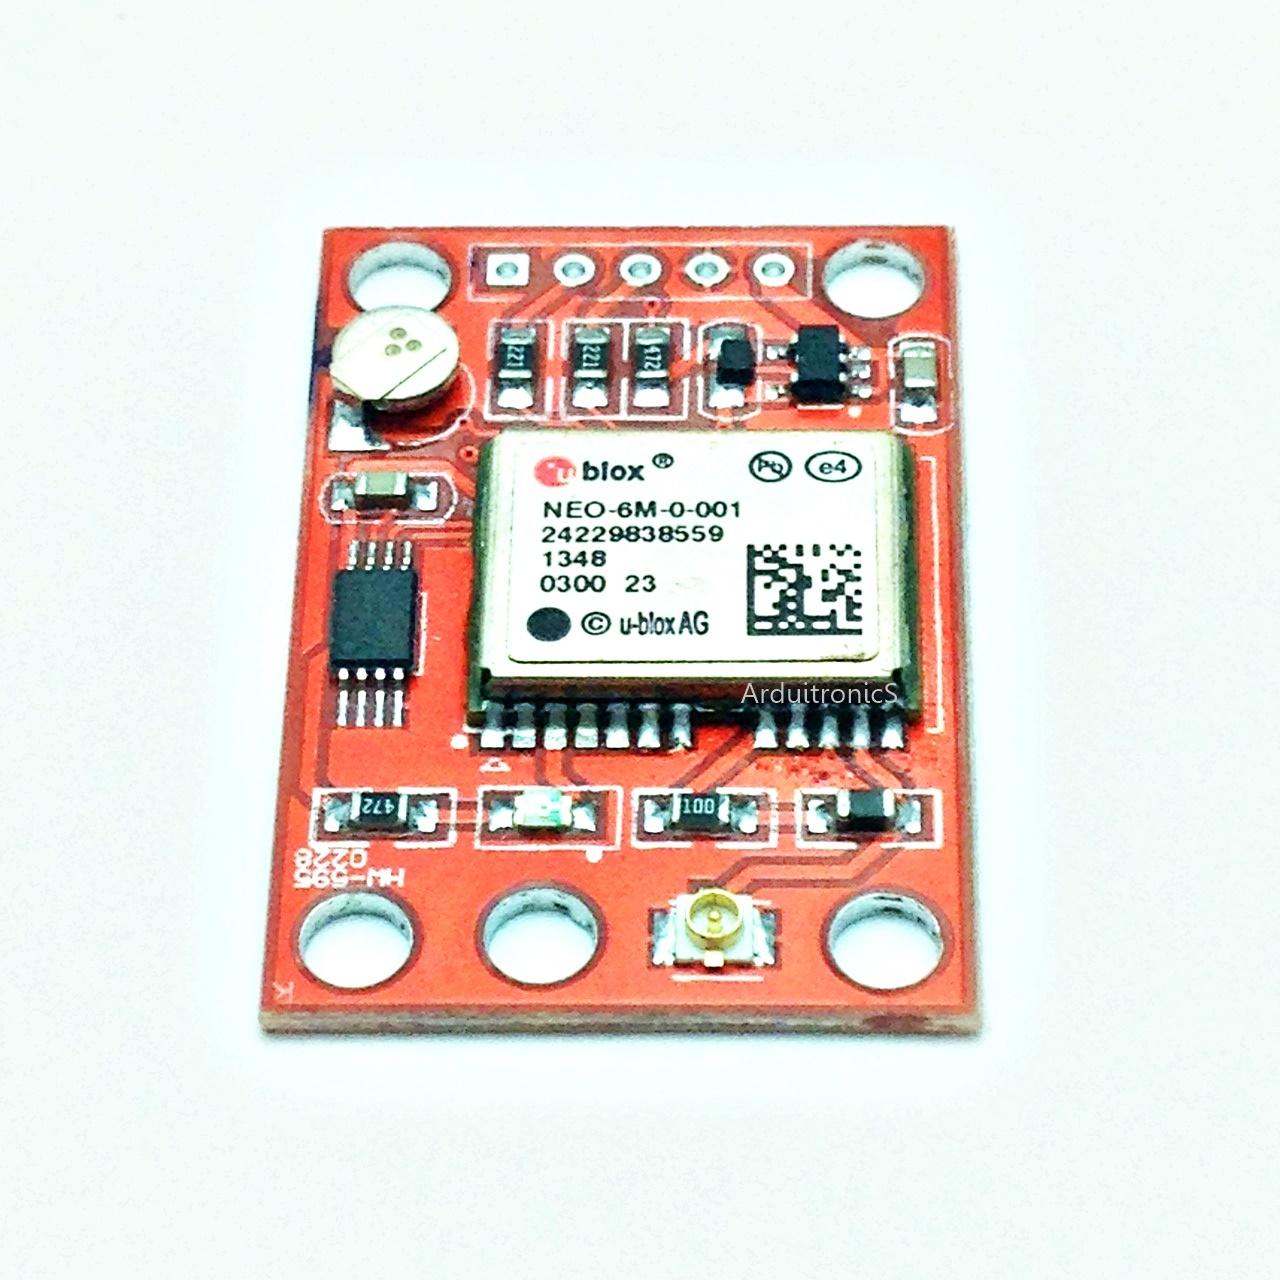 NEO-6M Ublox GPS Module NEO6MV2 พร้อมสายอากาศ